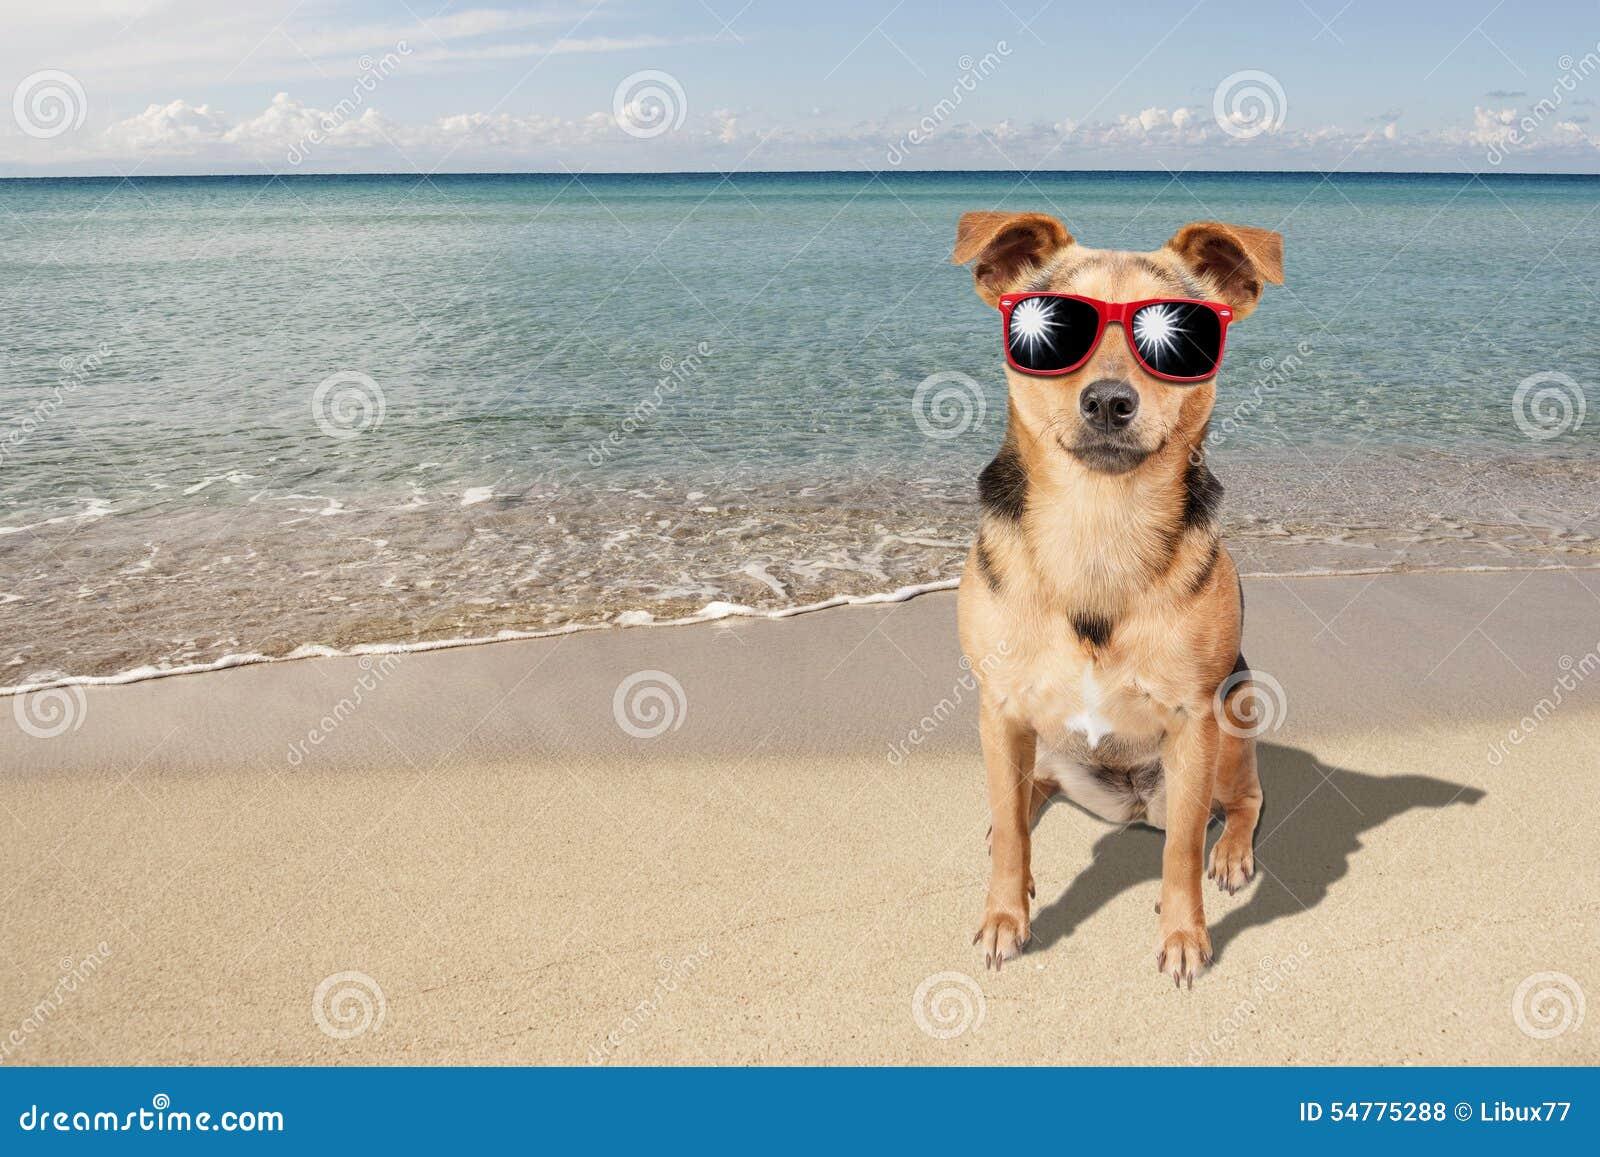 Dog Small Fawn Beach Sea Sunglasses